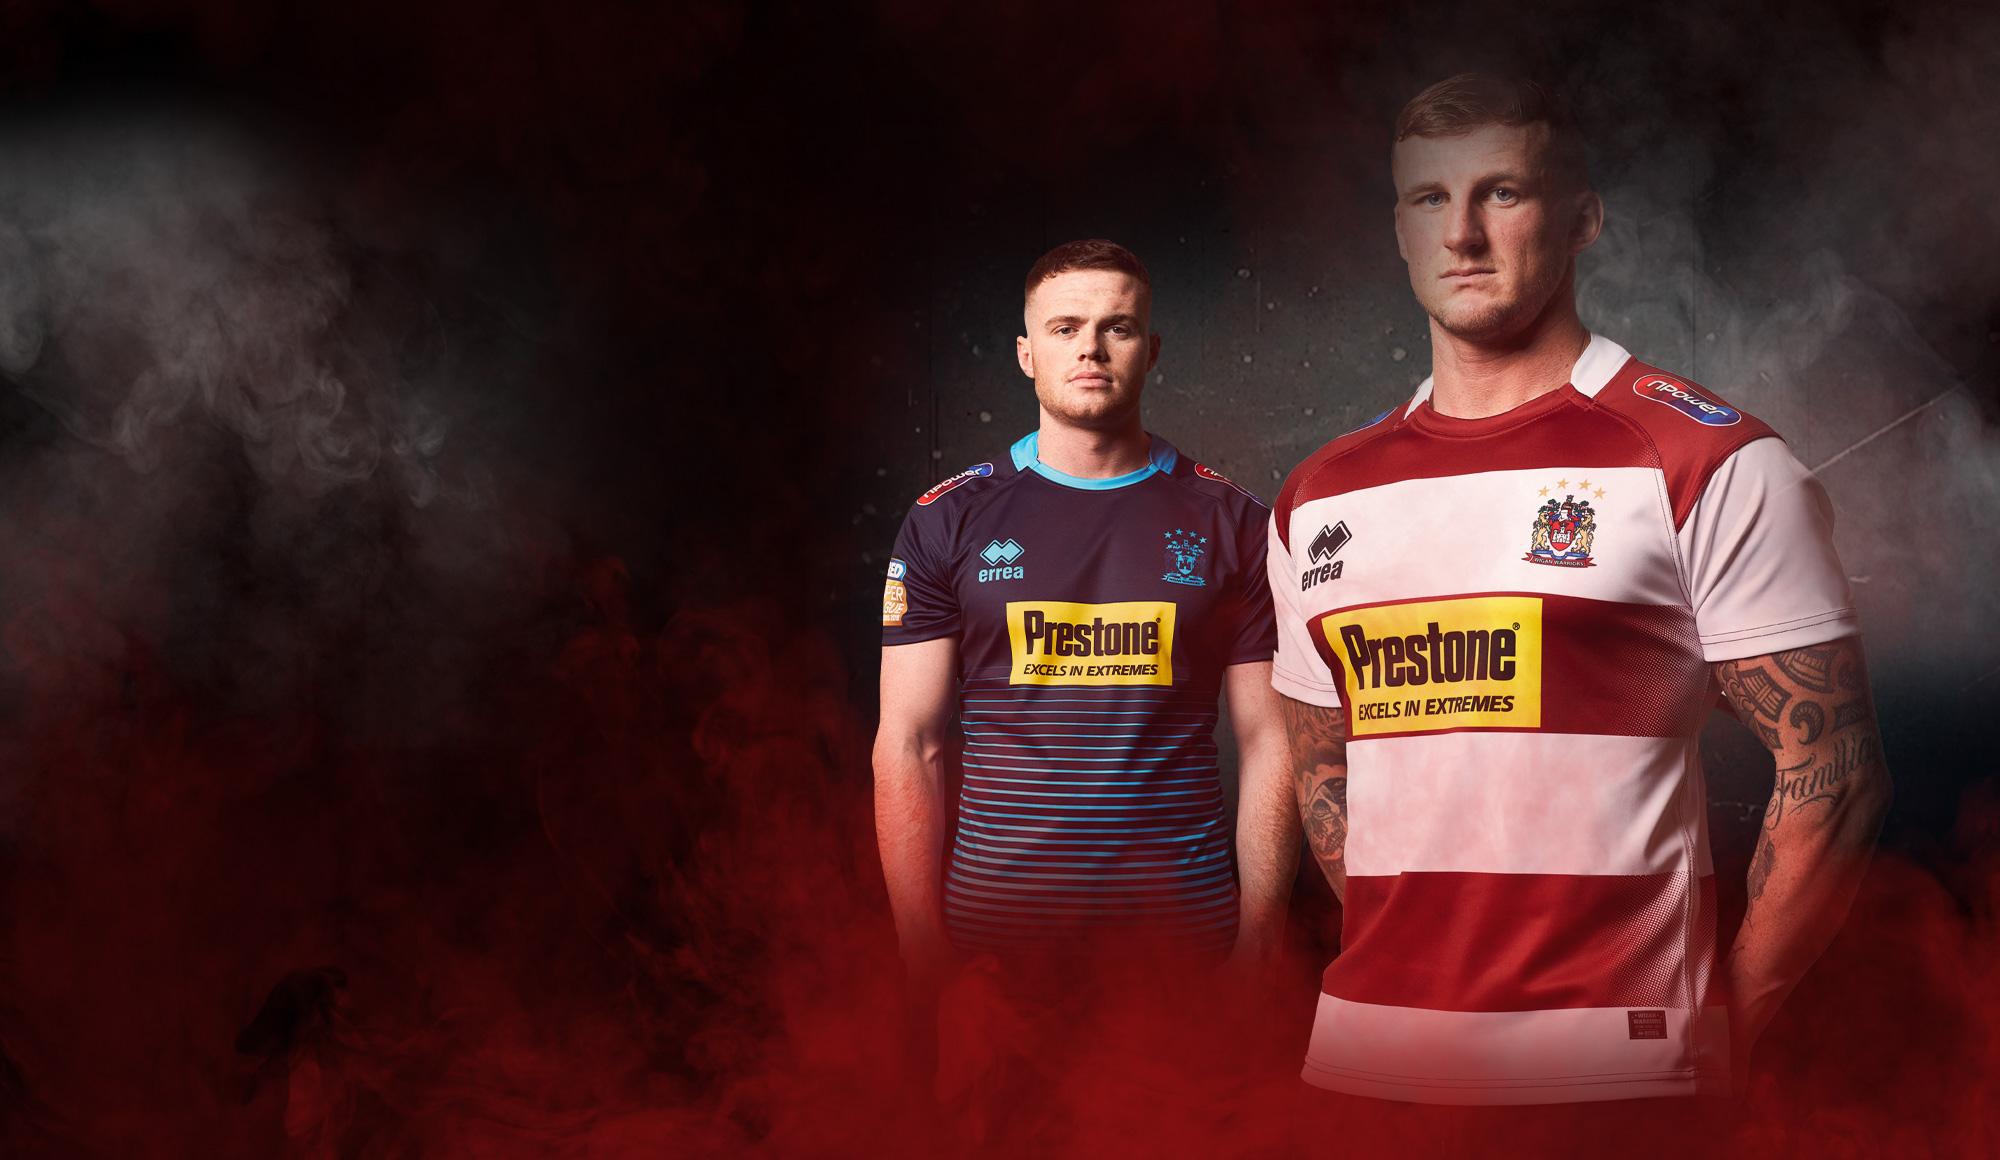 brand new 5ab40 d6006 Warriors release 2019 kits | News | Wigan Warriors